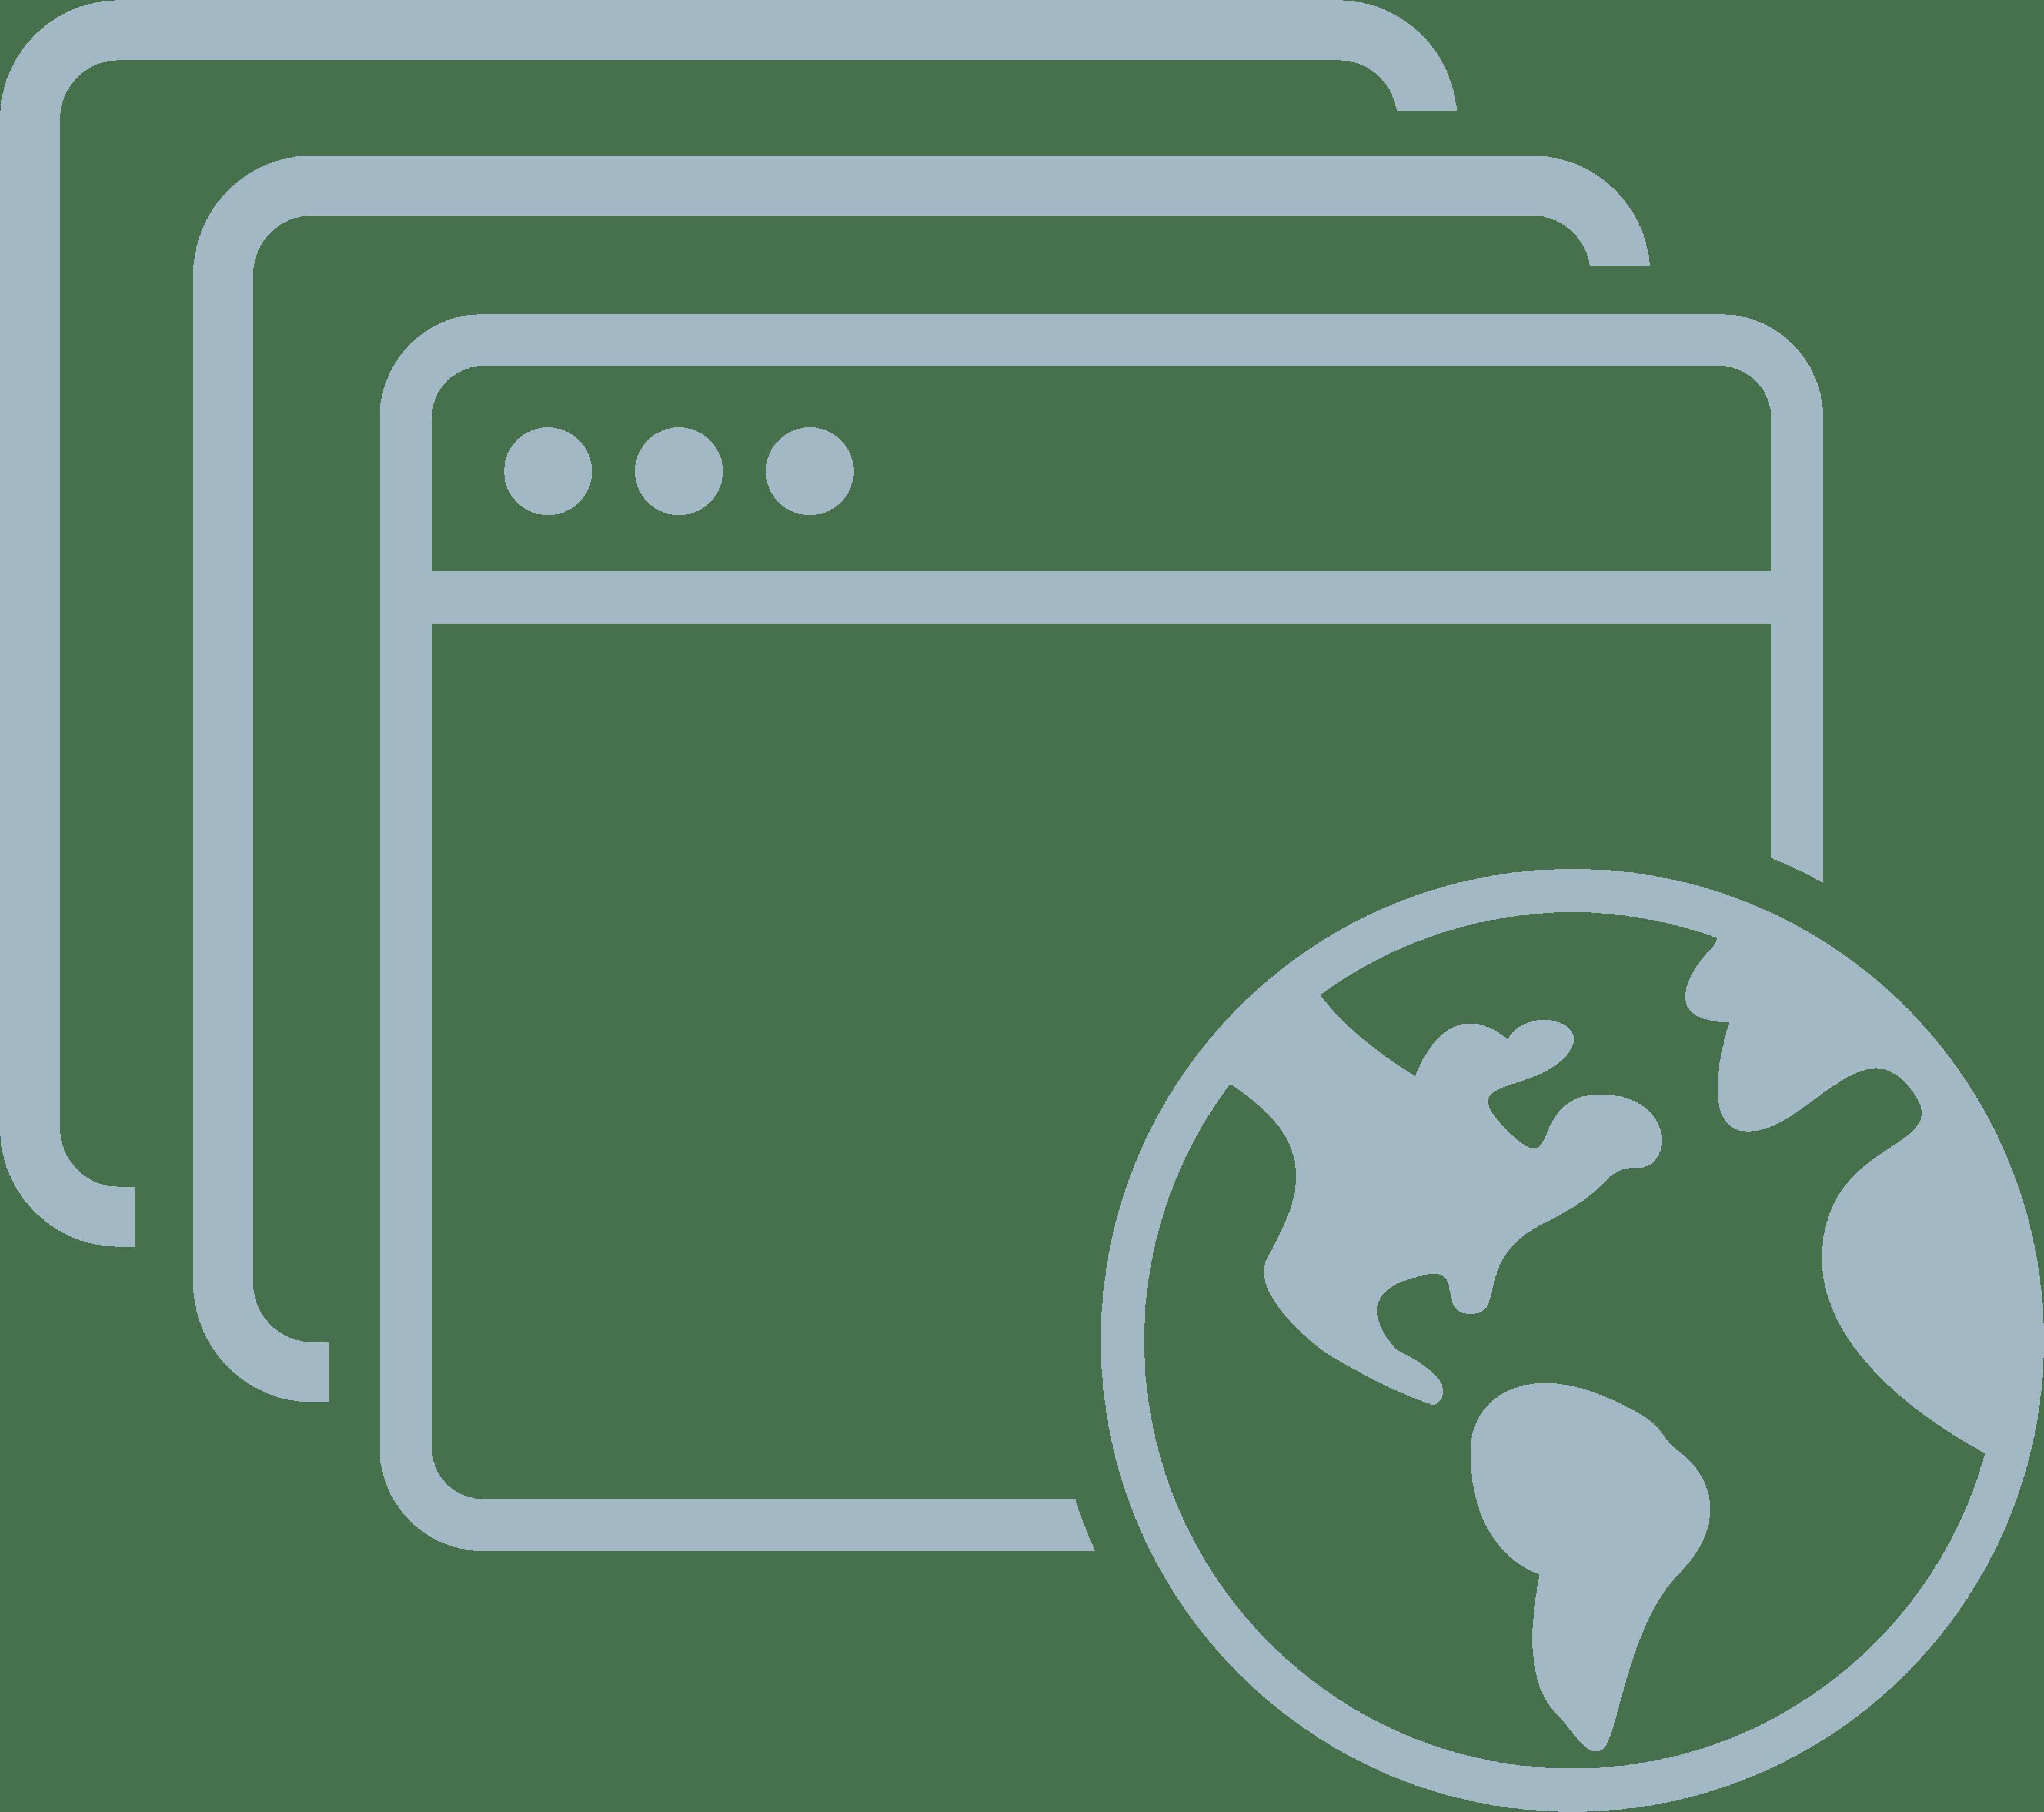 Application and Data Attacks, api security